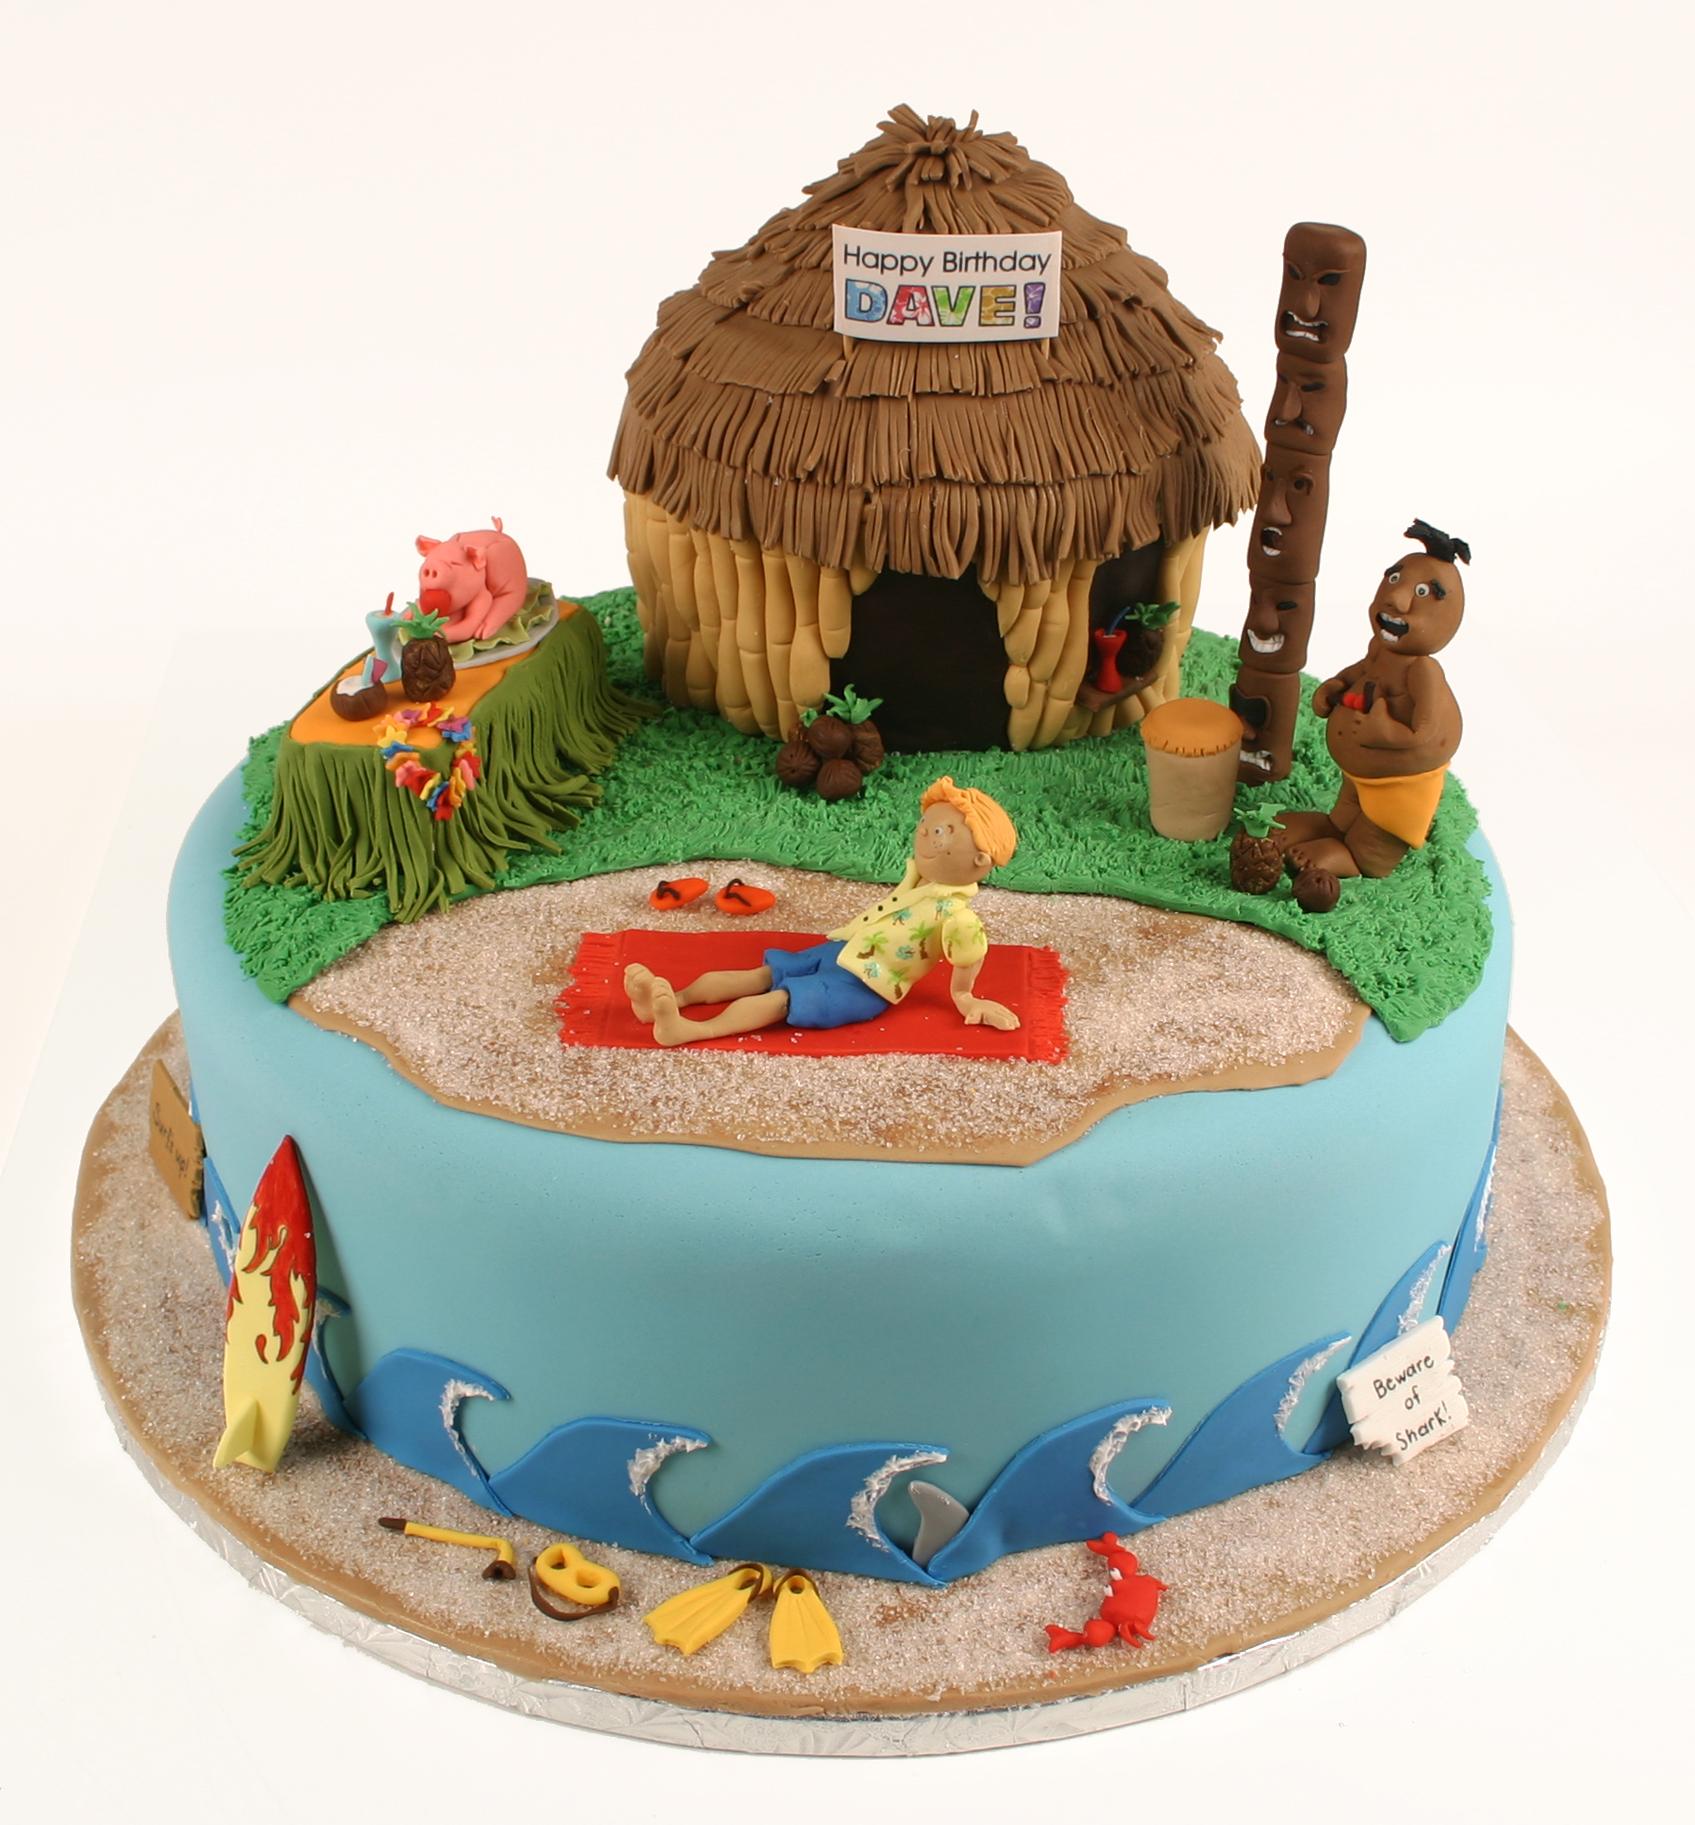 Daves 40th Birthday Luau Cake Autumn Carpenters Weblog